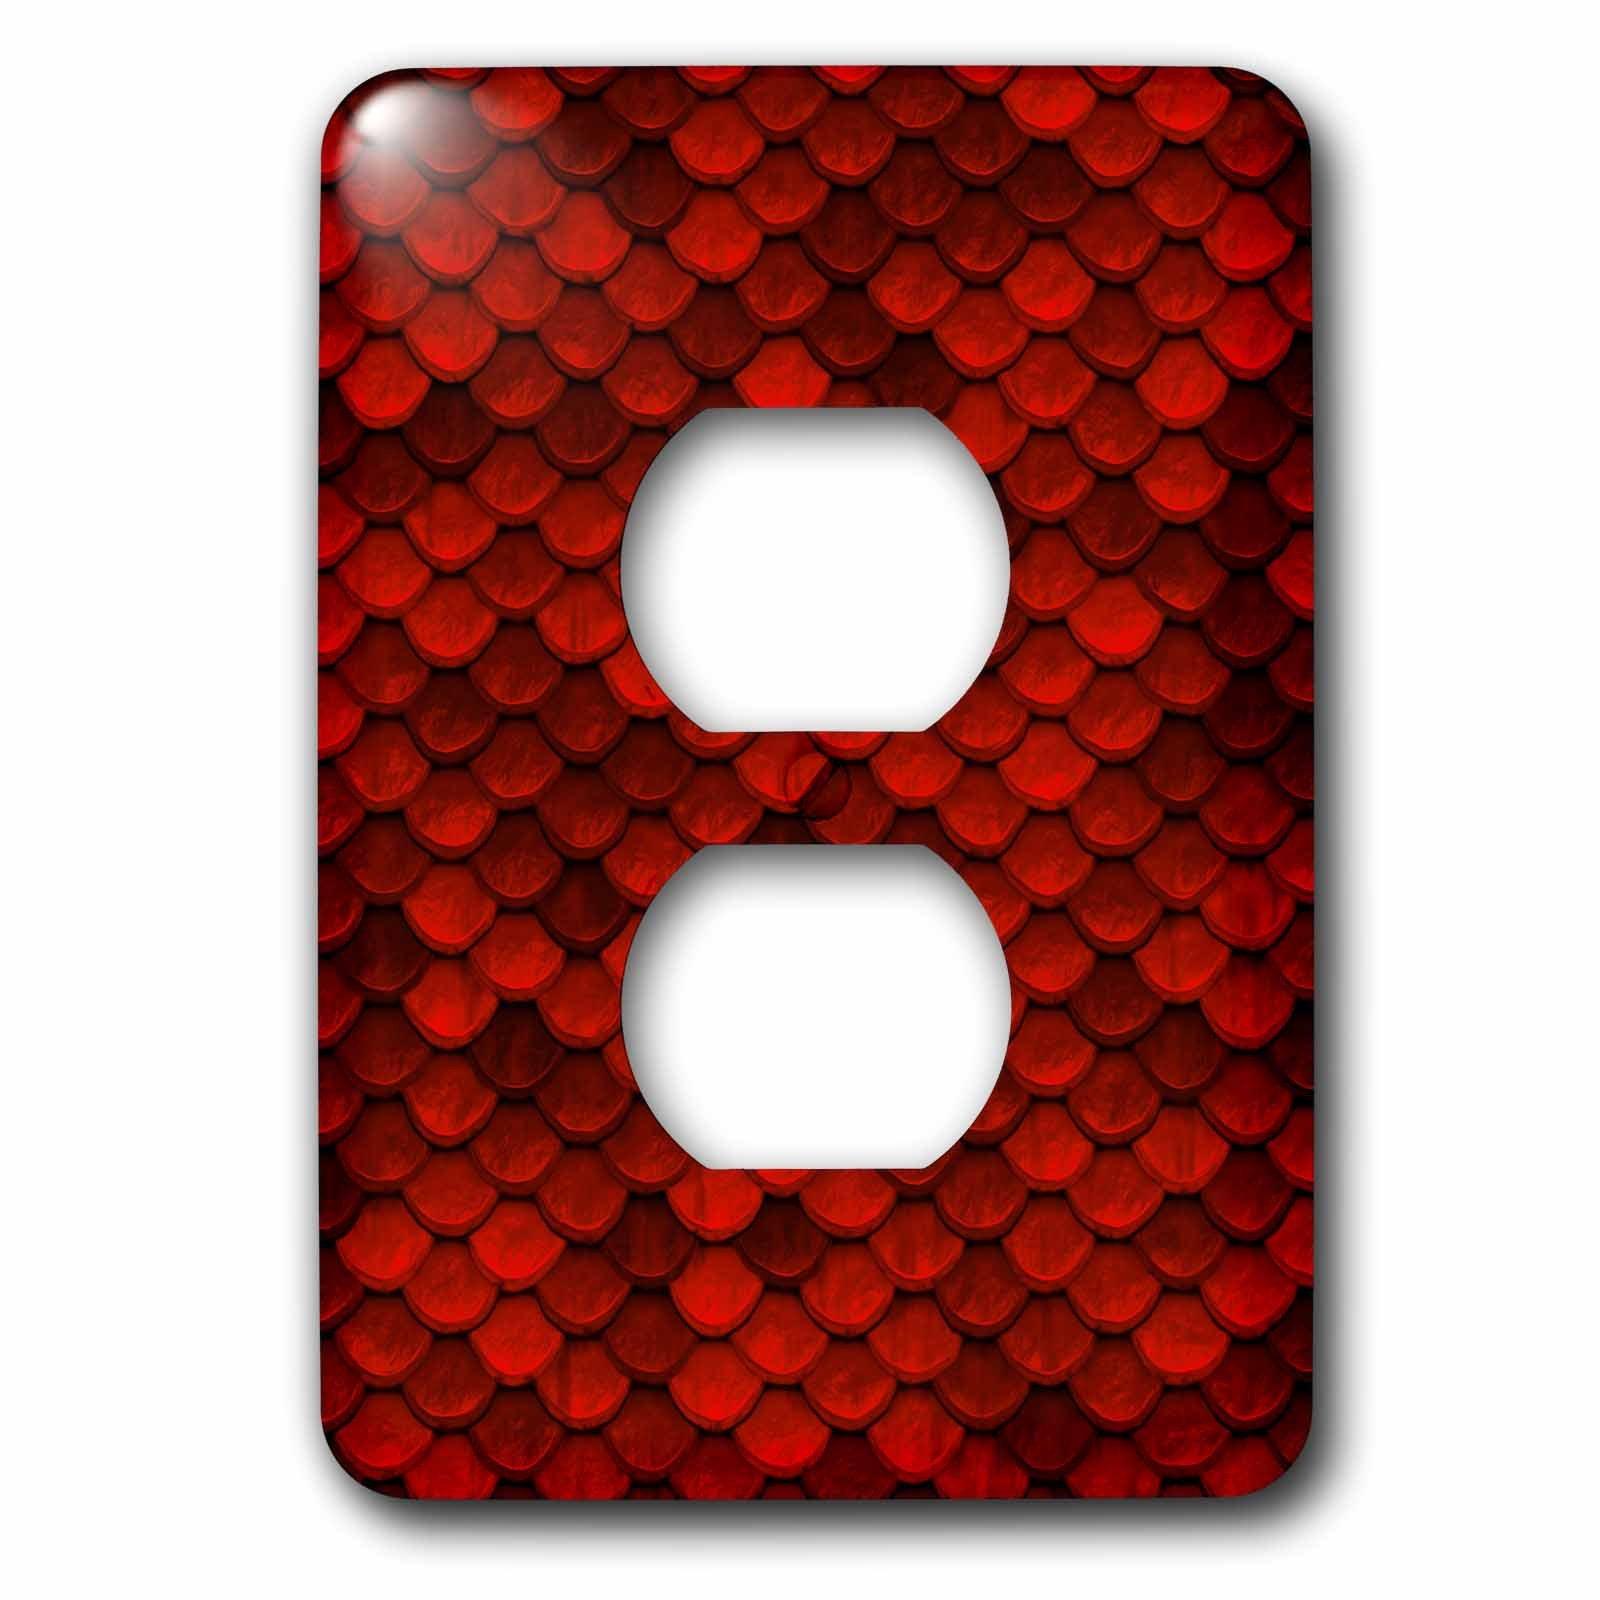 3dRose Uta Naumann Faux Glitter Pattern - Sparkling Red Luxury Elegant Mermaid Scales Glitter Effect Artprint - Light Switch Covers - 2 plug outlet cover (lsp_267057_6)